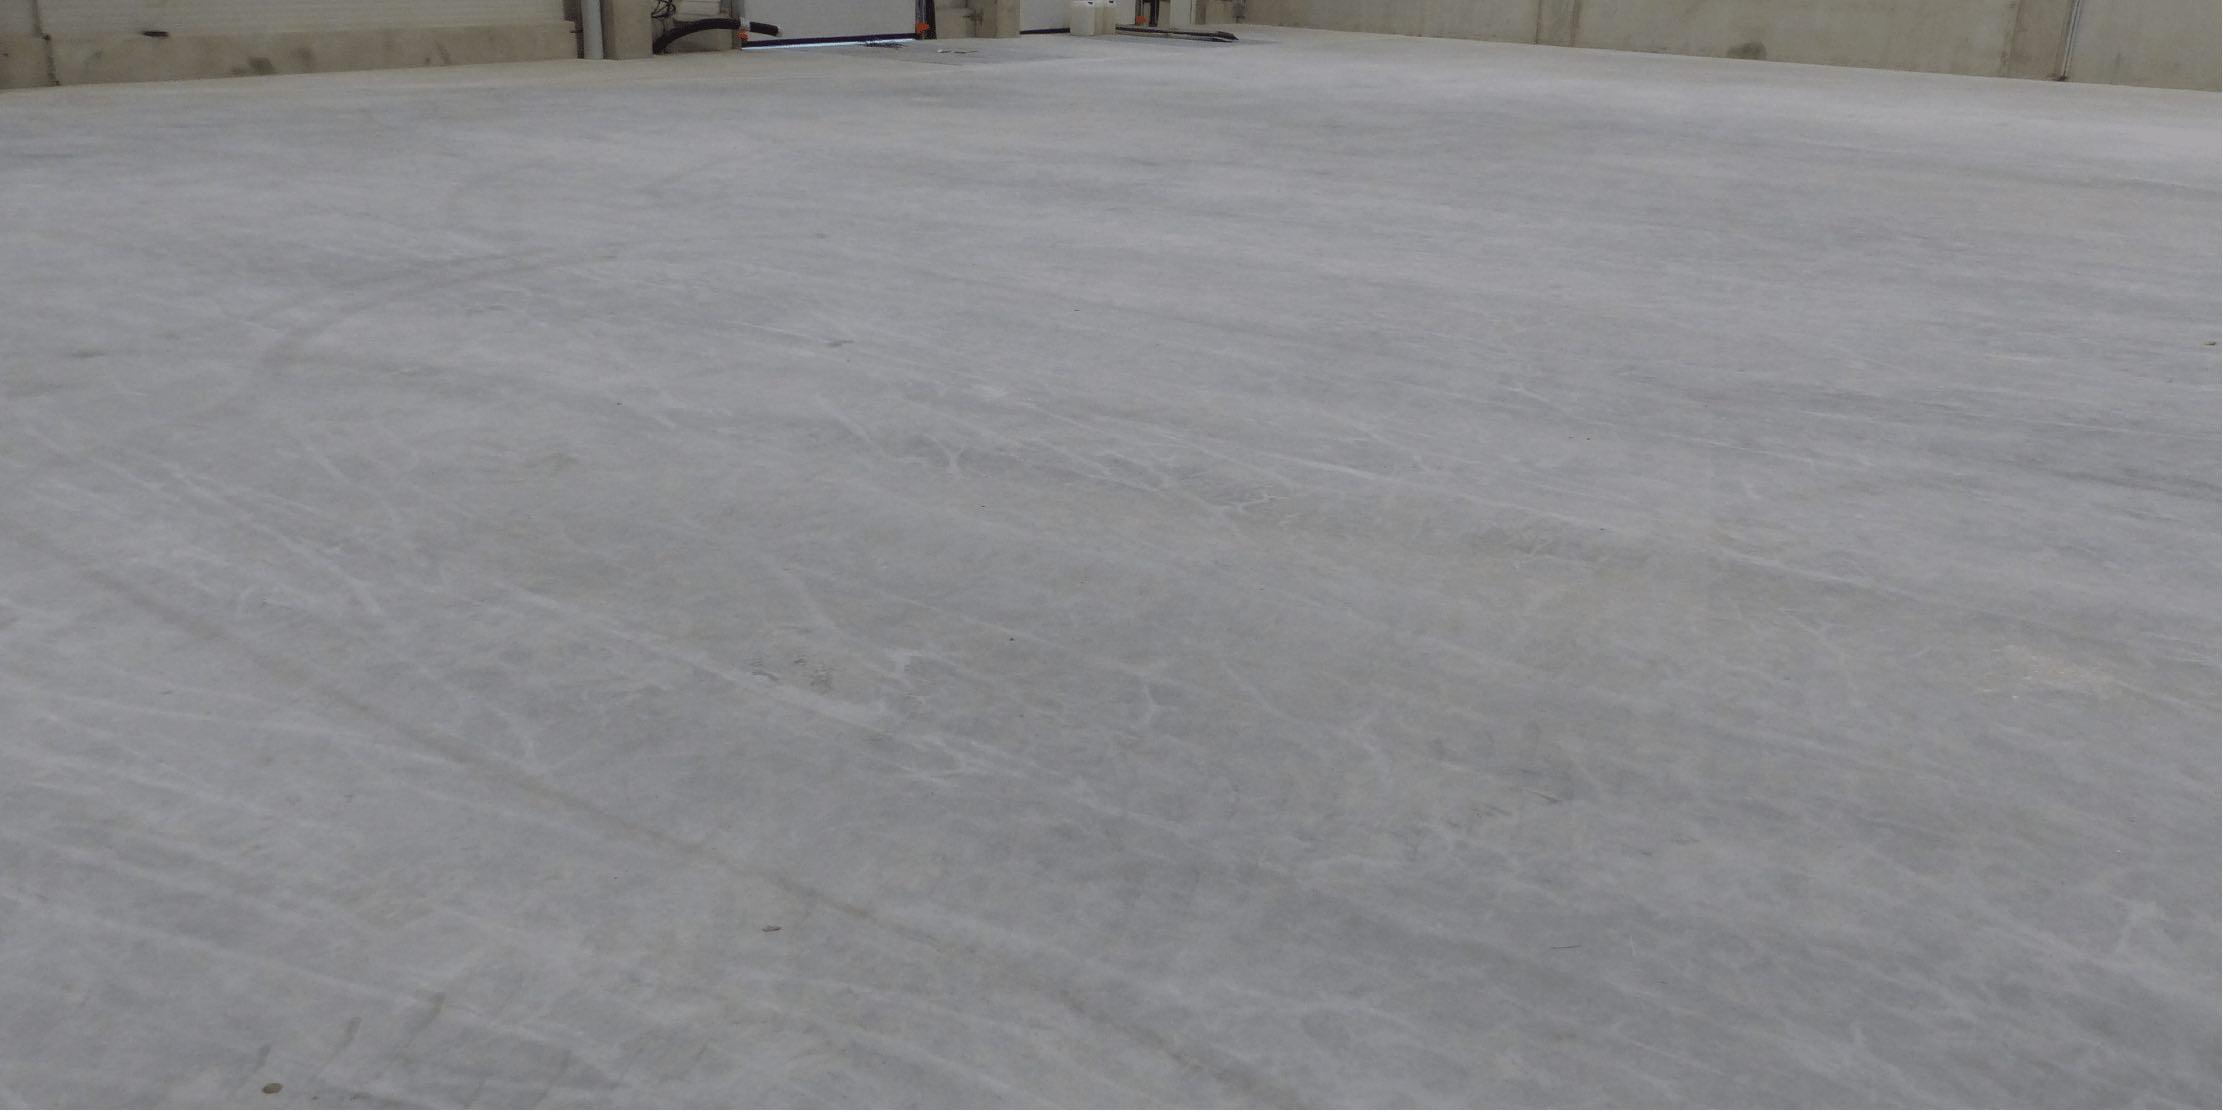 Untreated Concrete Floor